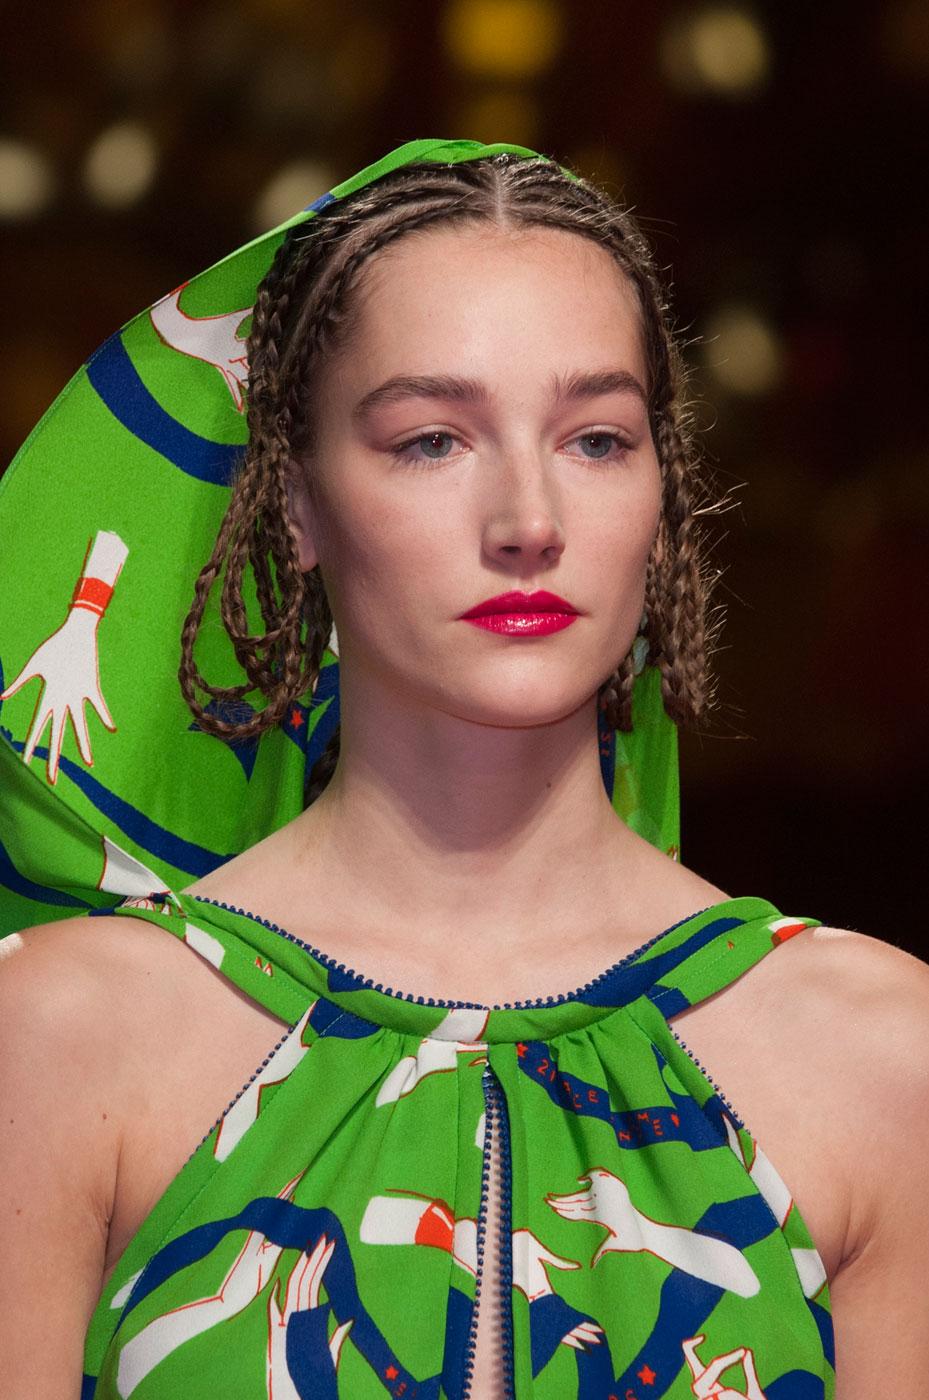 Schiaparelli-fashion-runway-show-close-ups-haute-couture-paris-spring-summer-2015-the-impression-31